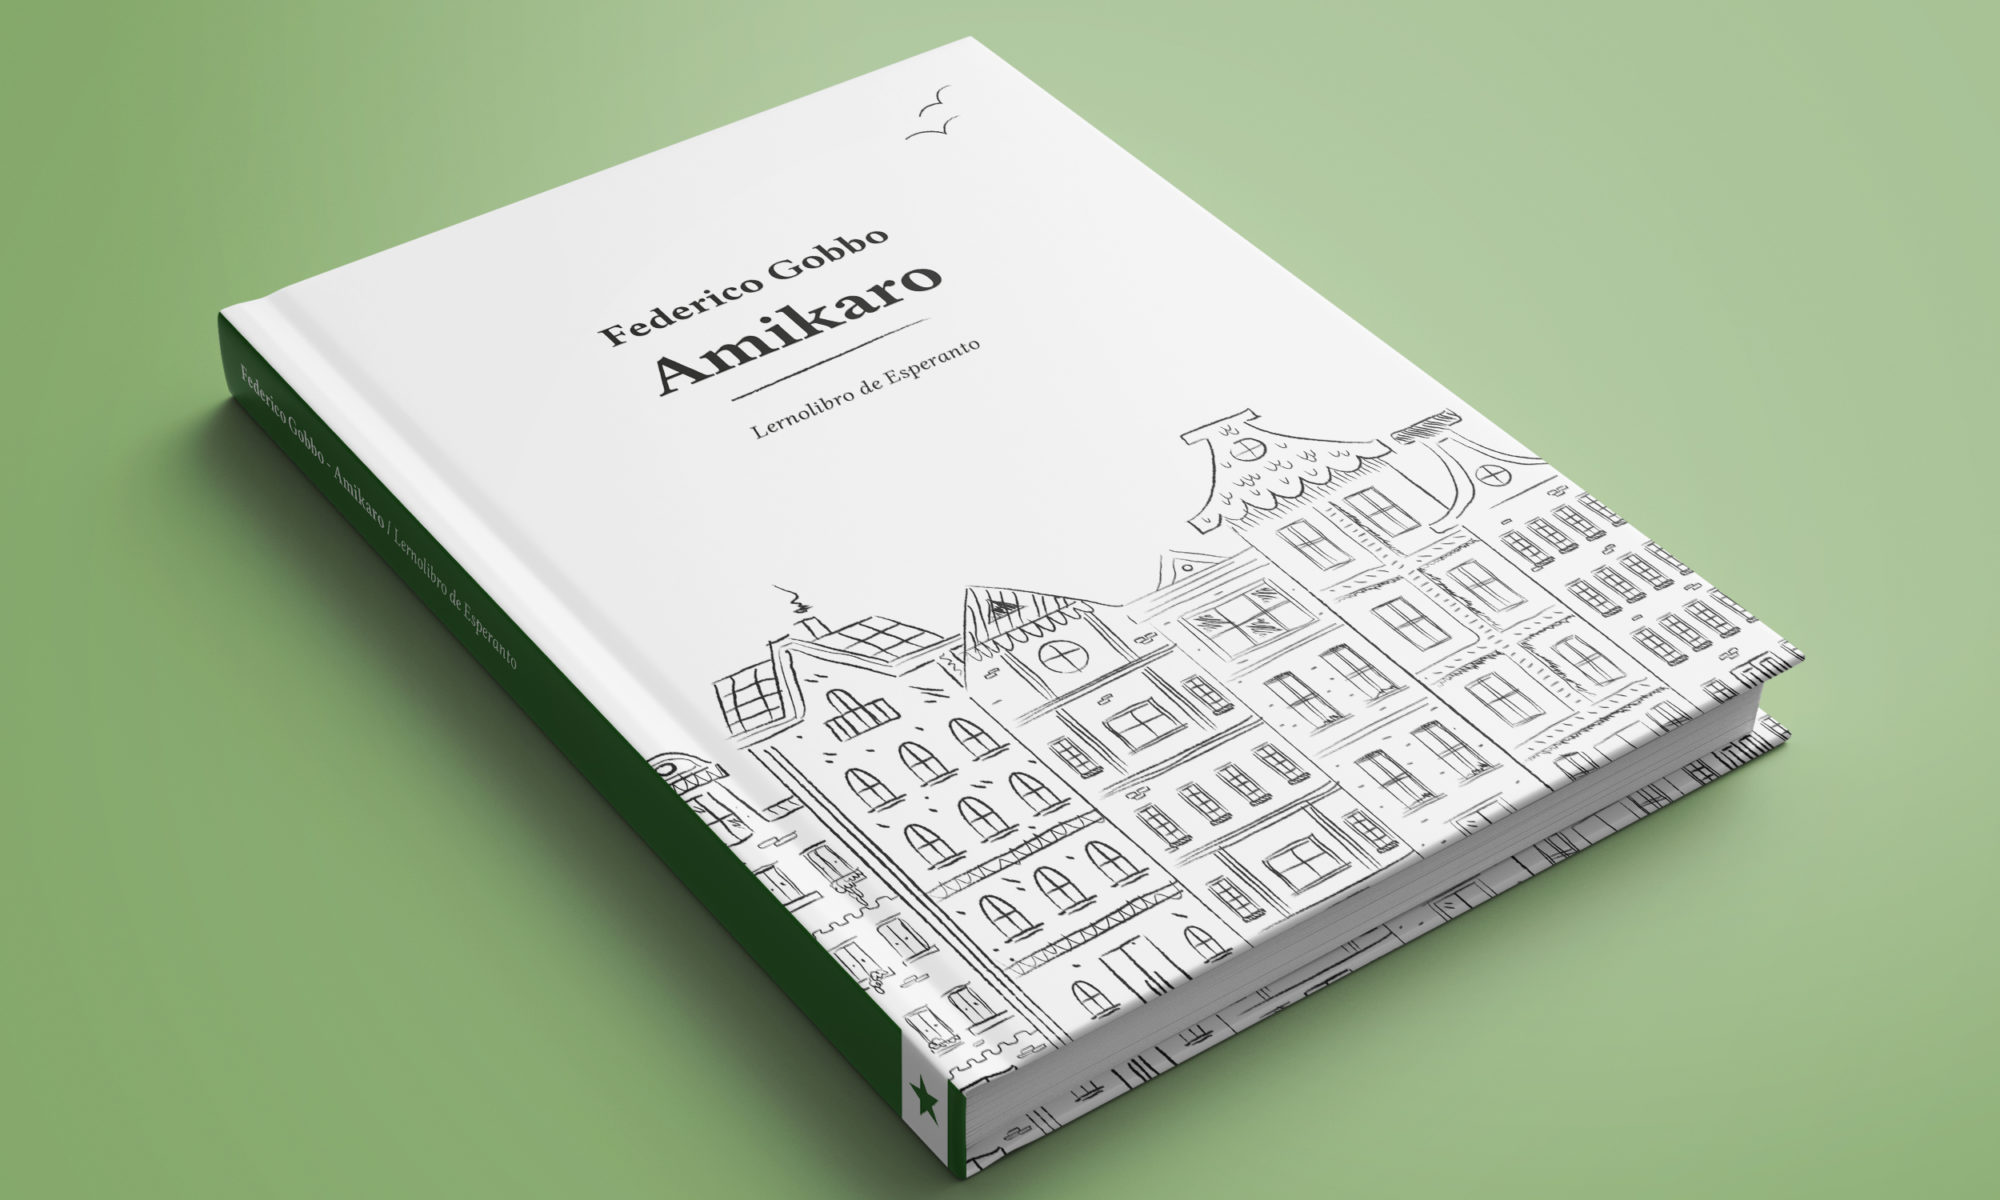 Amikaro